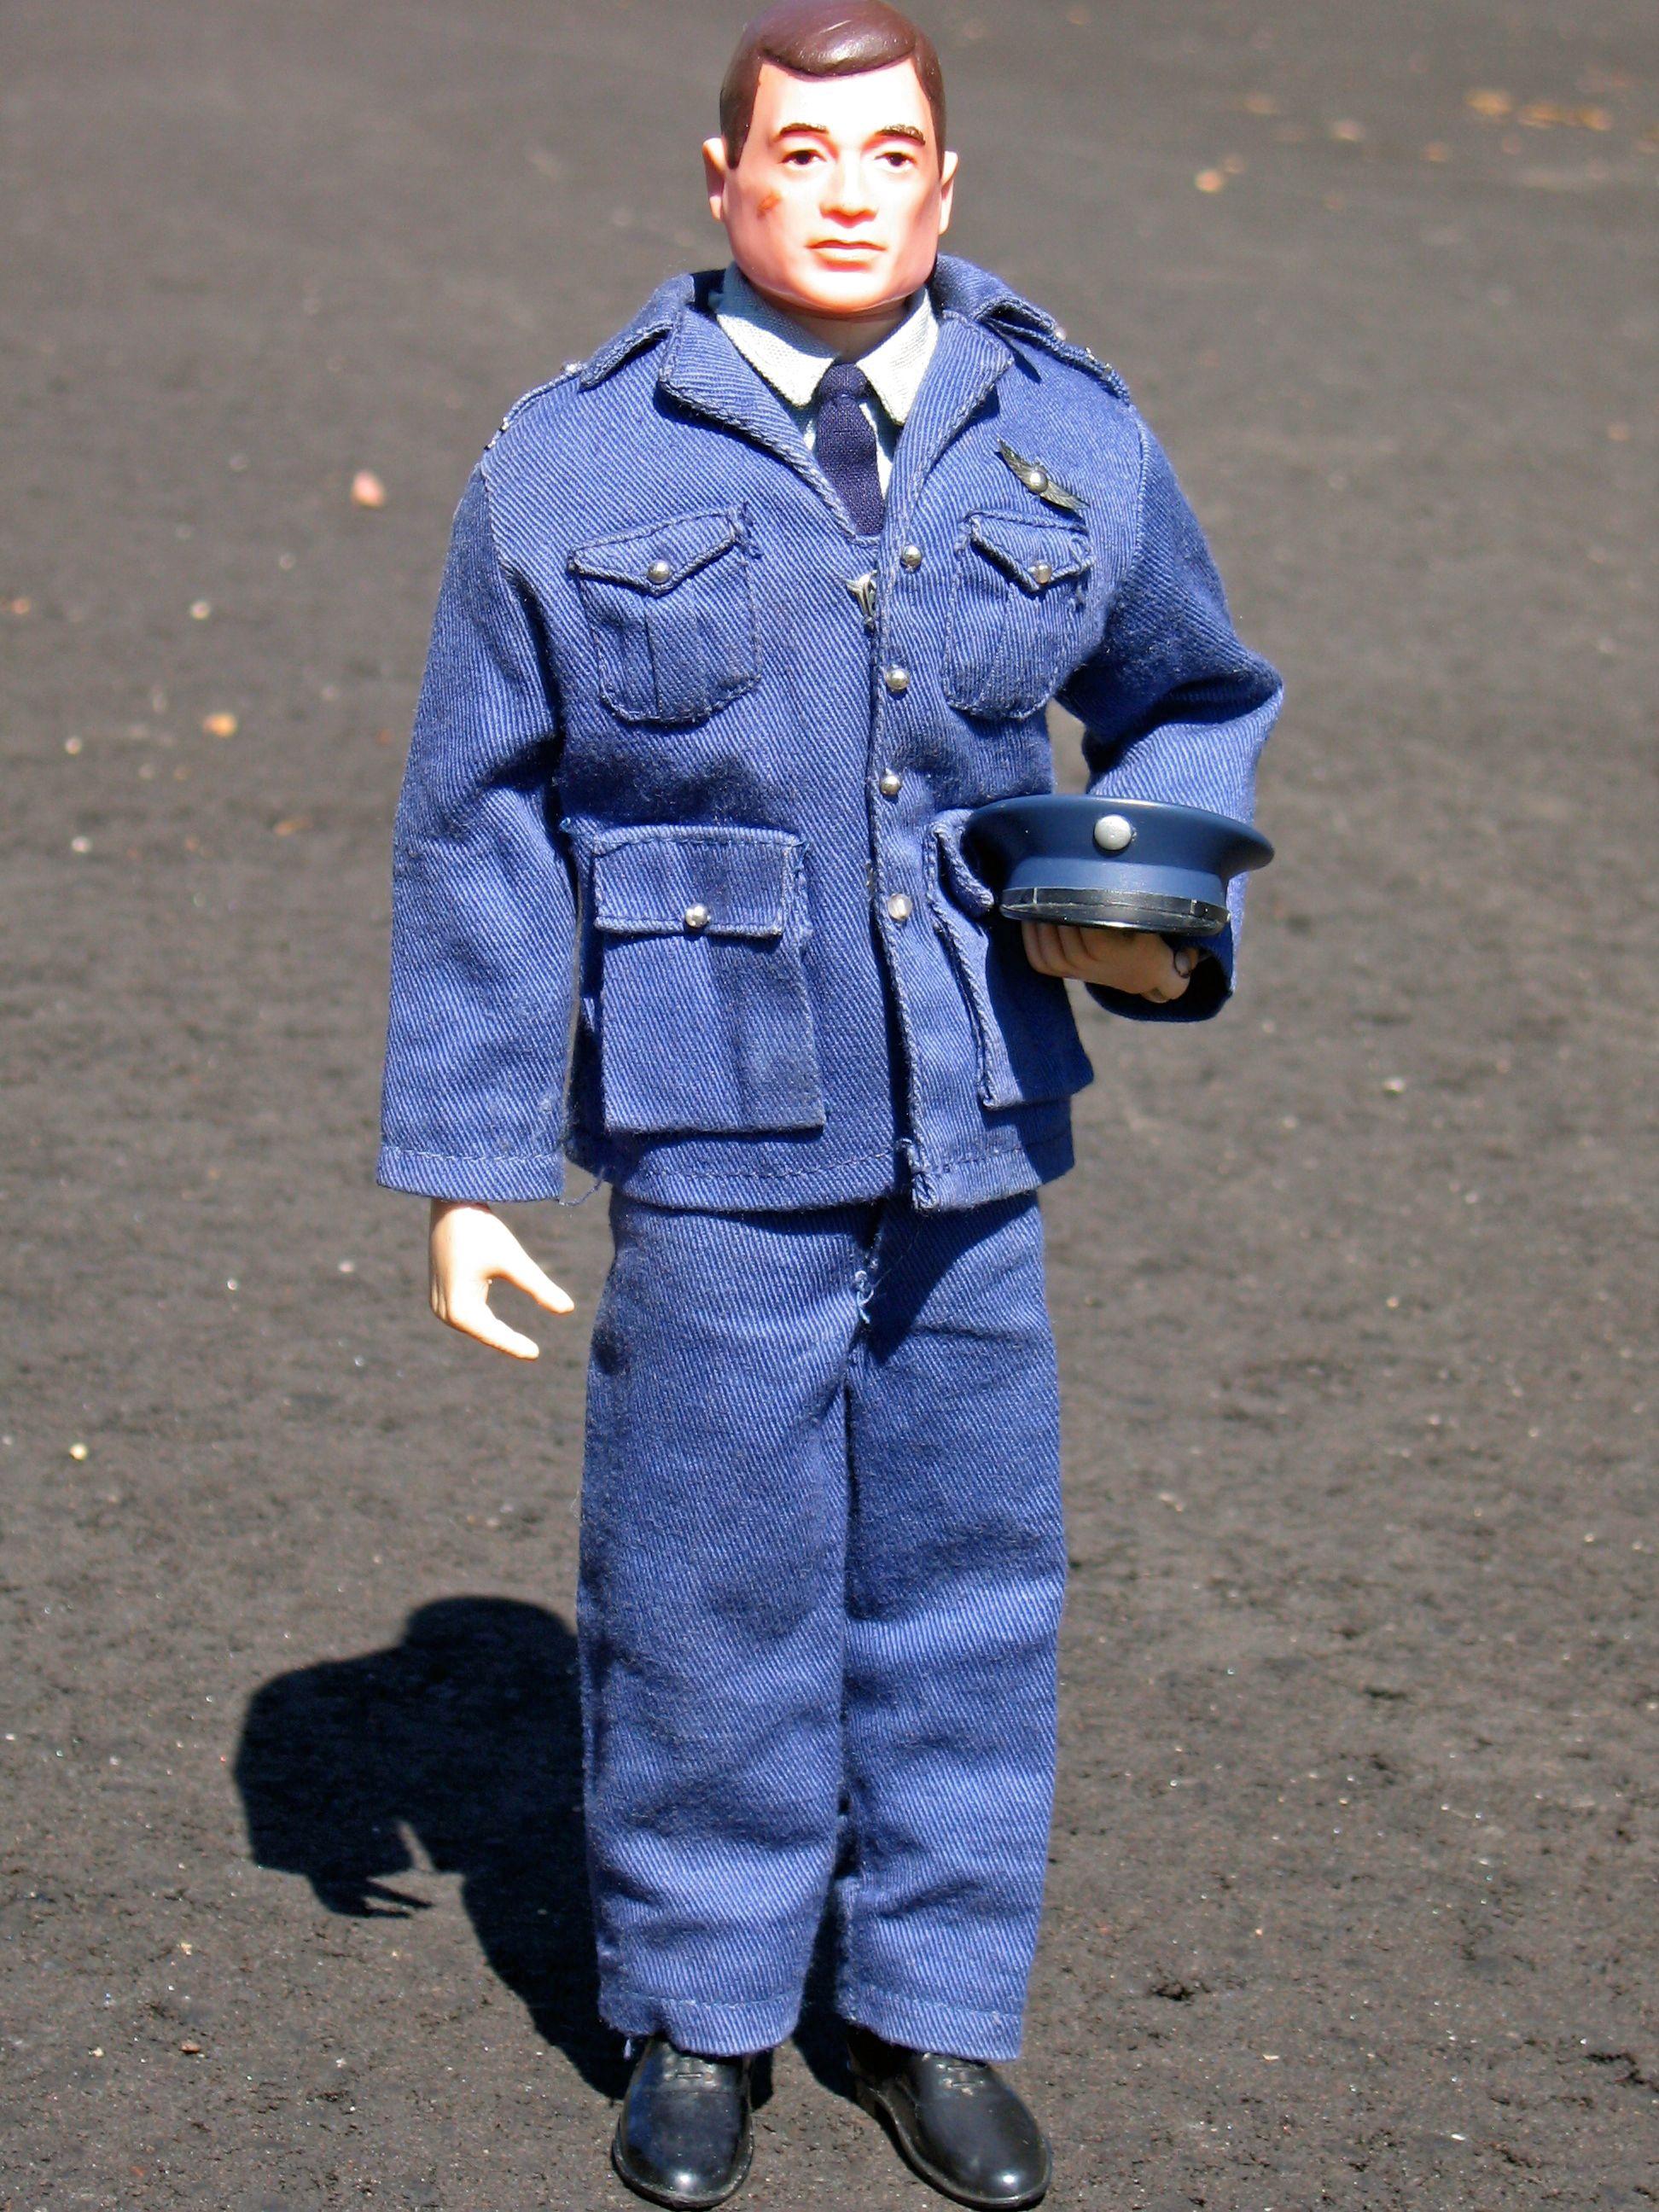 Vintage Gi Joe Action Pilot Air Force Dress Uniform Set 7803 Gi Joe Vintage Toys 1970s Air Force Dress Uniform